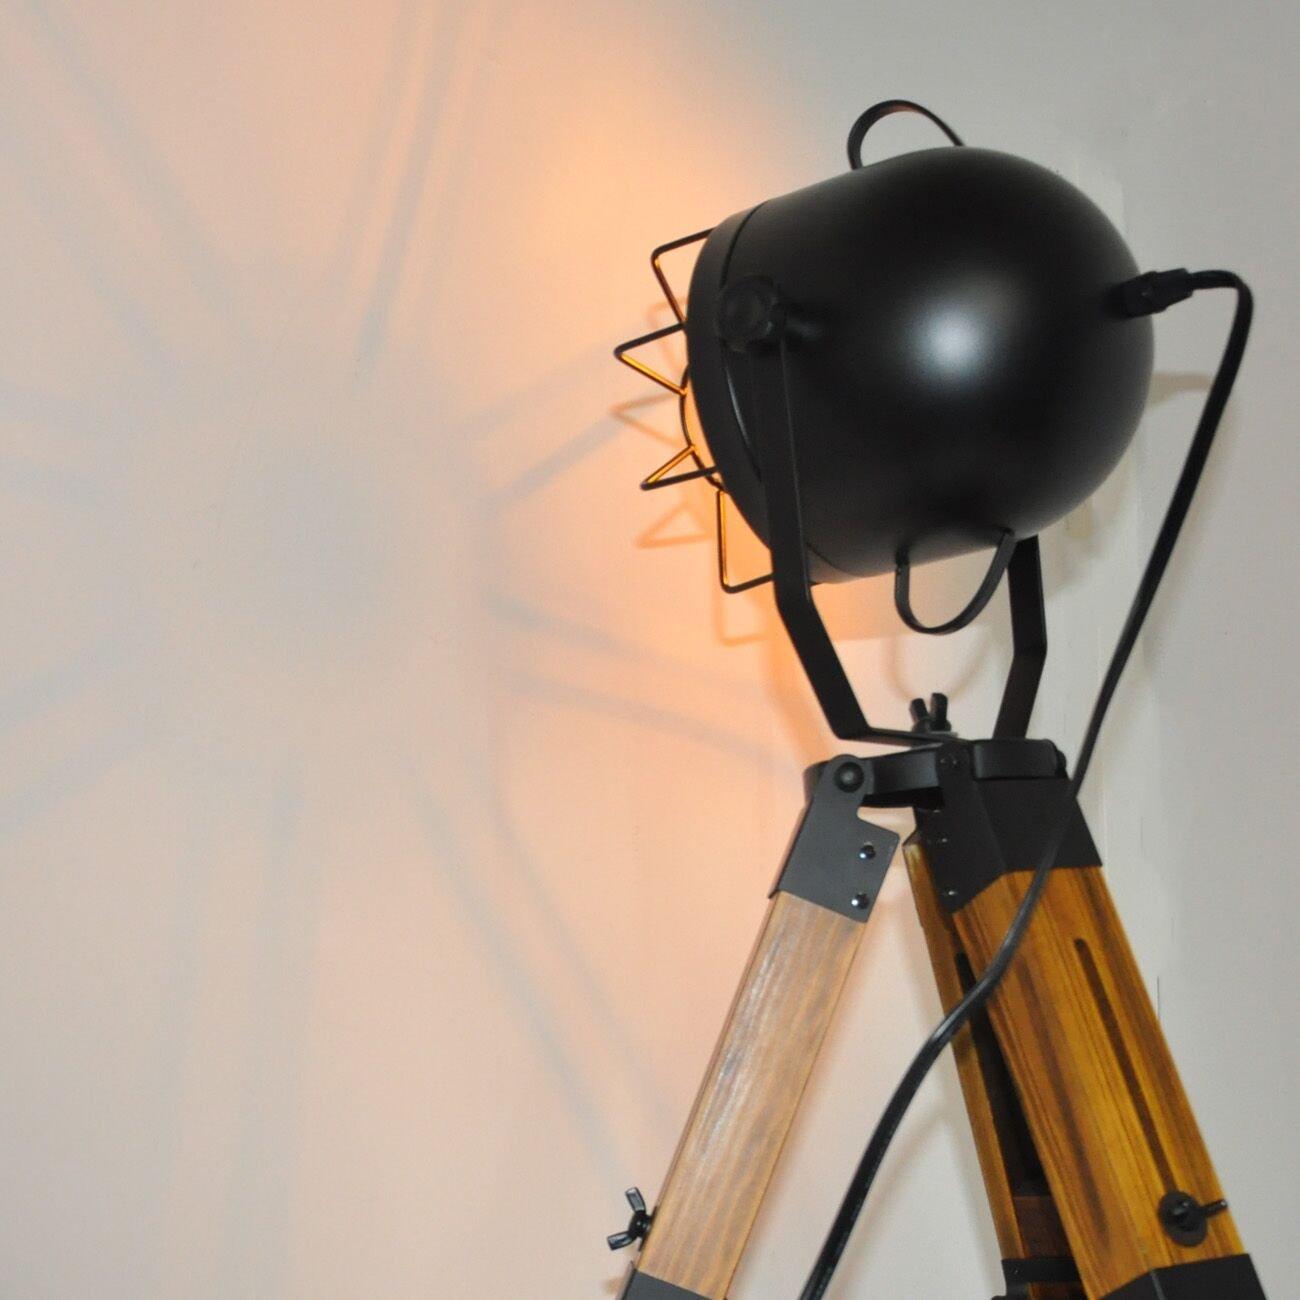 Decoluce Industrial Tripod Floor Table Lamp Vintage Wood Cinema Searchlight Standing Lighting Fixtures Nautical Spotlight Decorations-Not Include E26 Bulbs Cinema